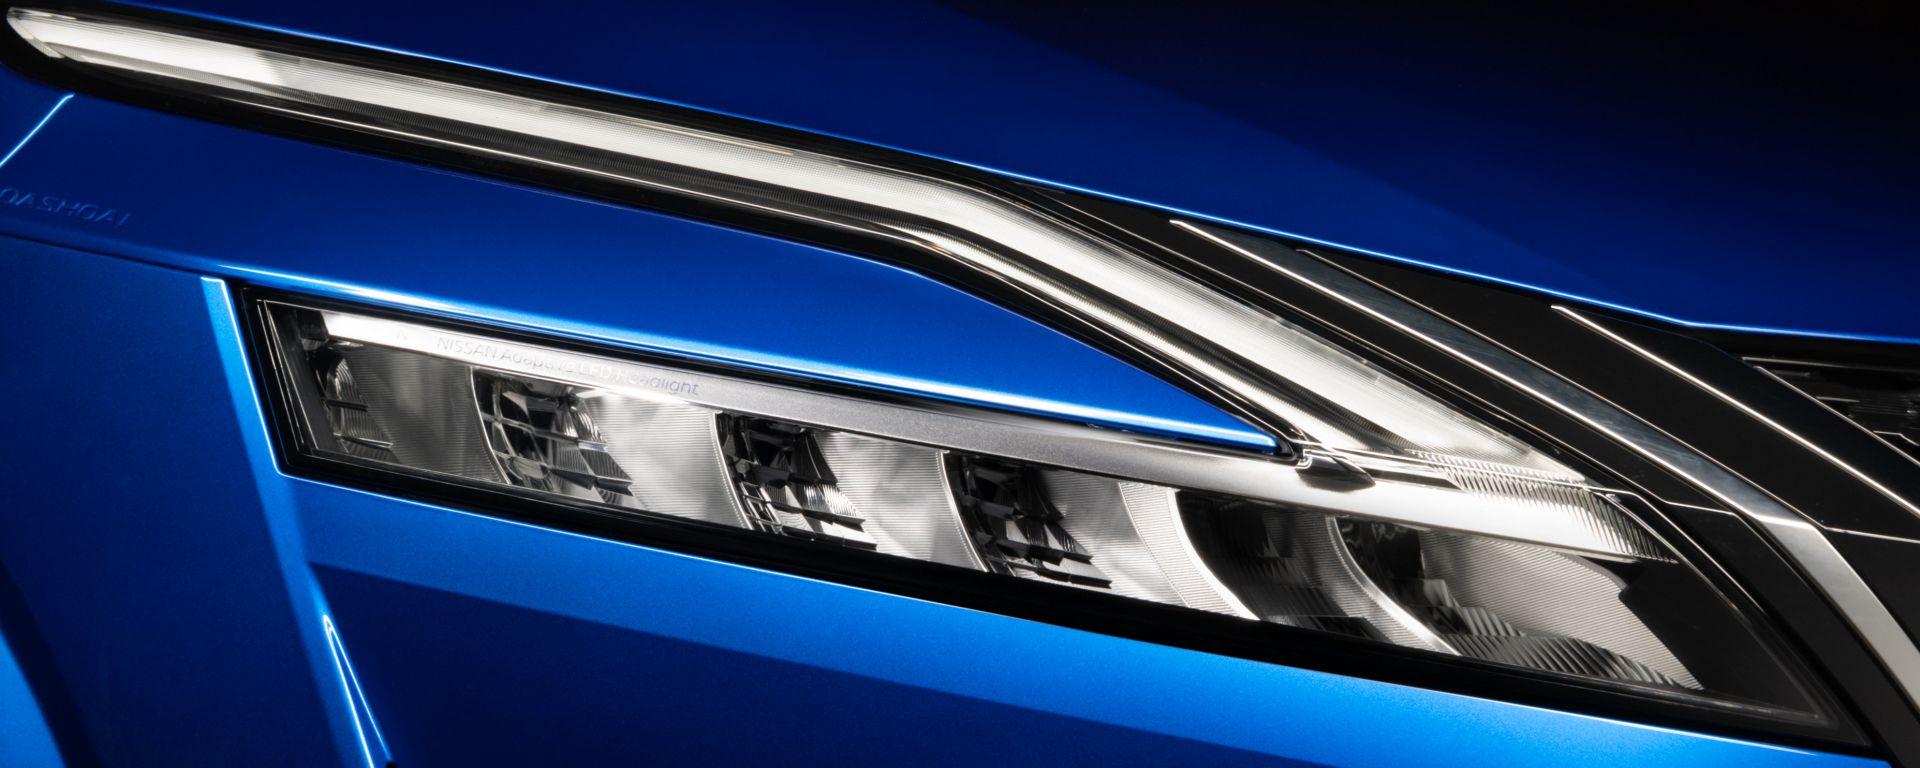 Nissan Qashqai 2021, appuntamento online il 18 febbraio